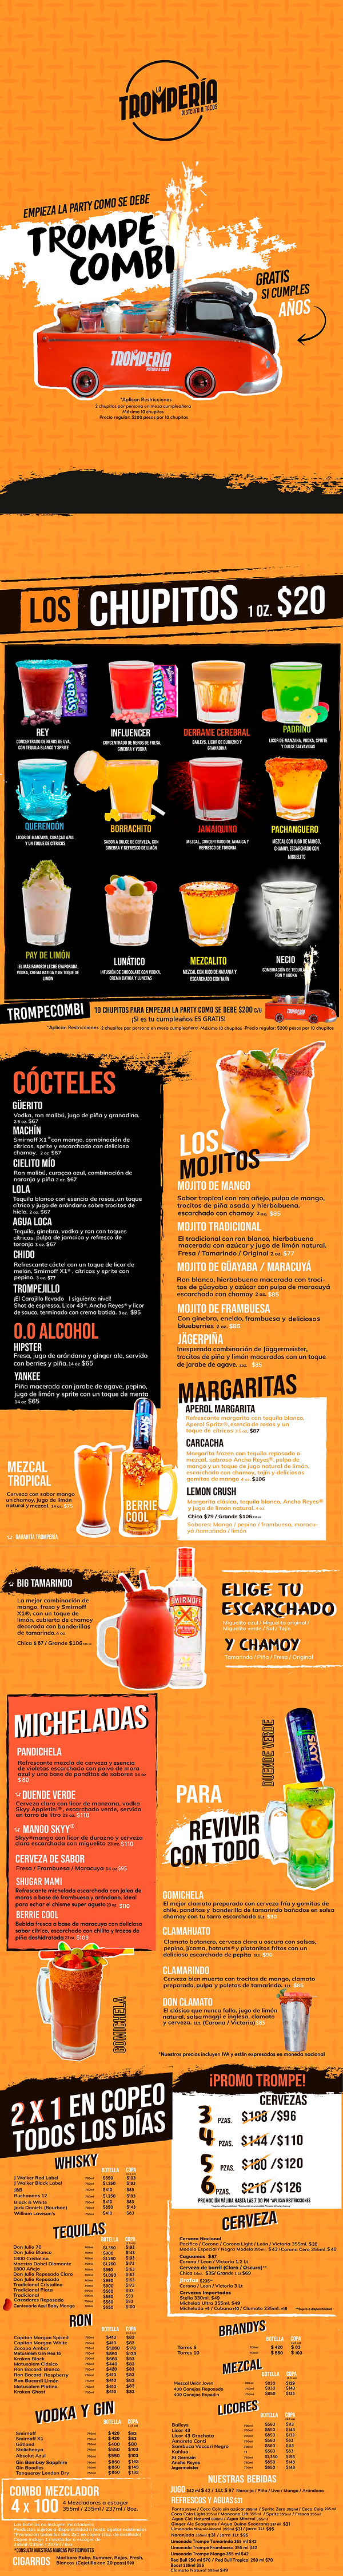 Menu web bebidas junio 8.png